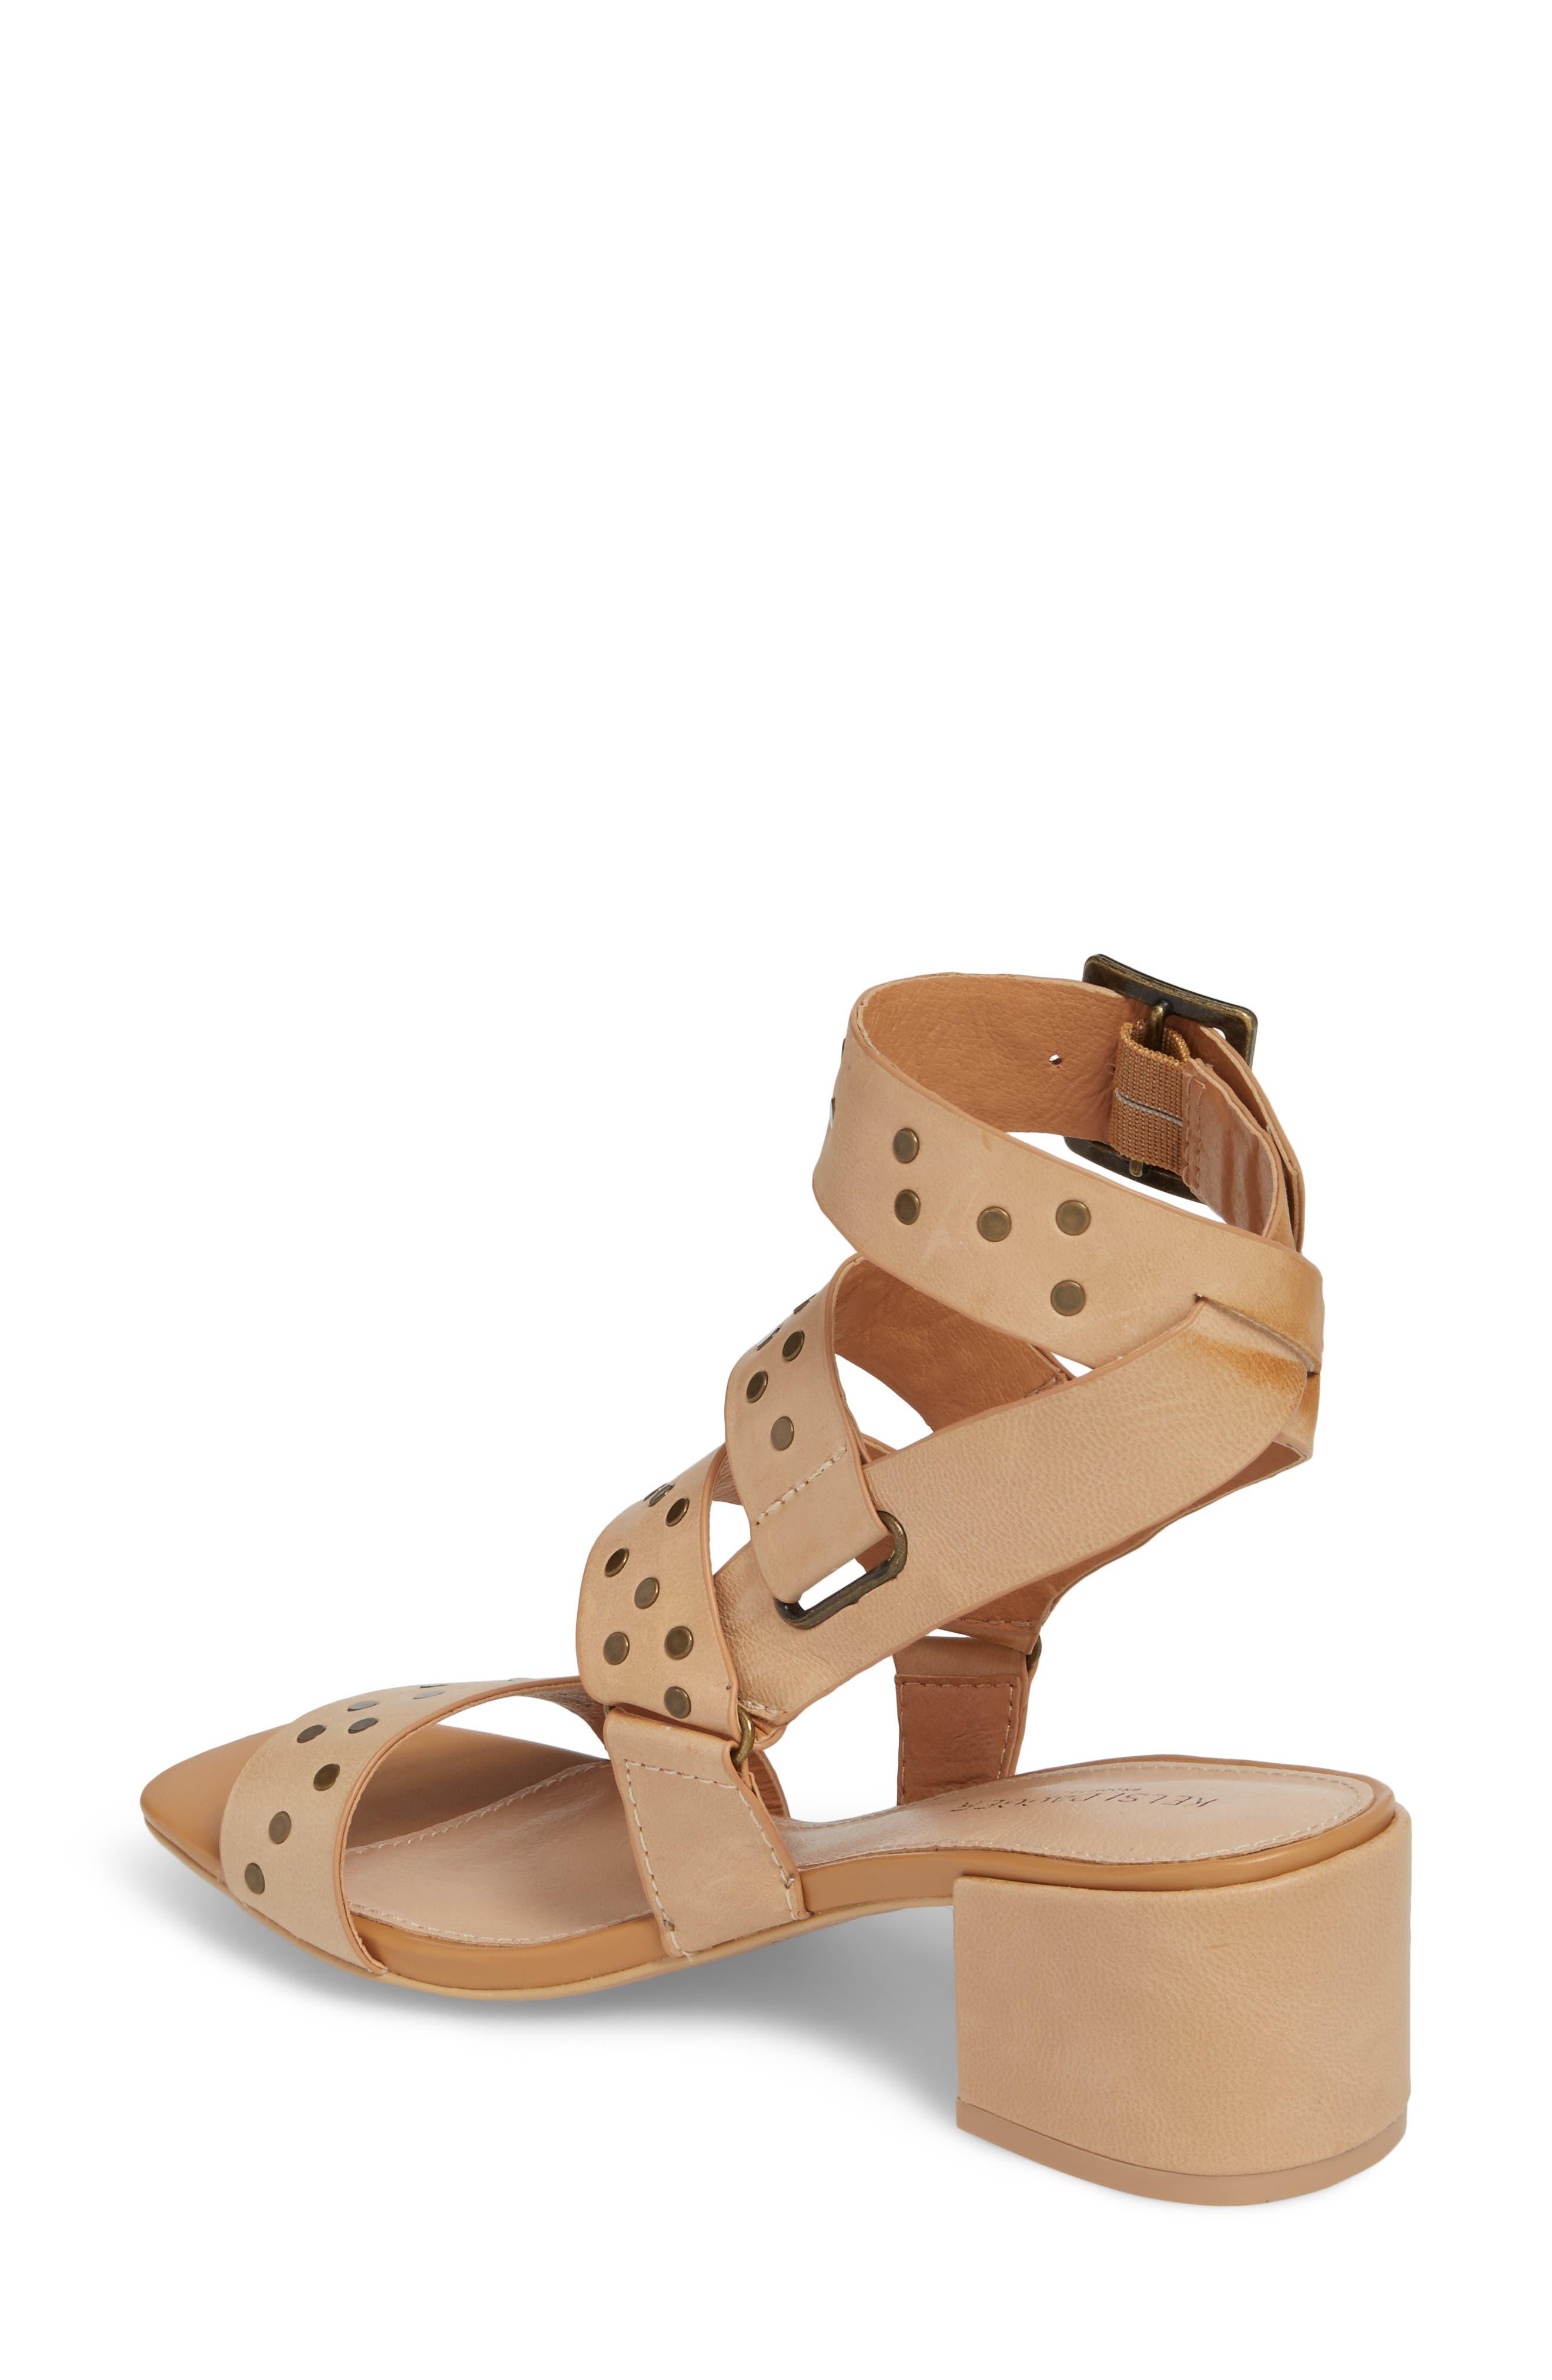 Seabring City Sandal,                             Alternate thumbnail 2, color,                             Tan Leather